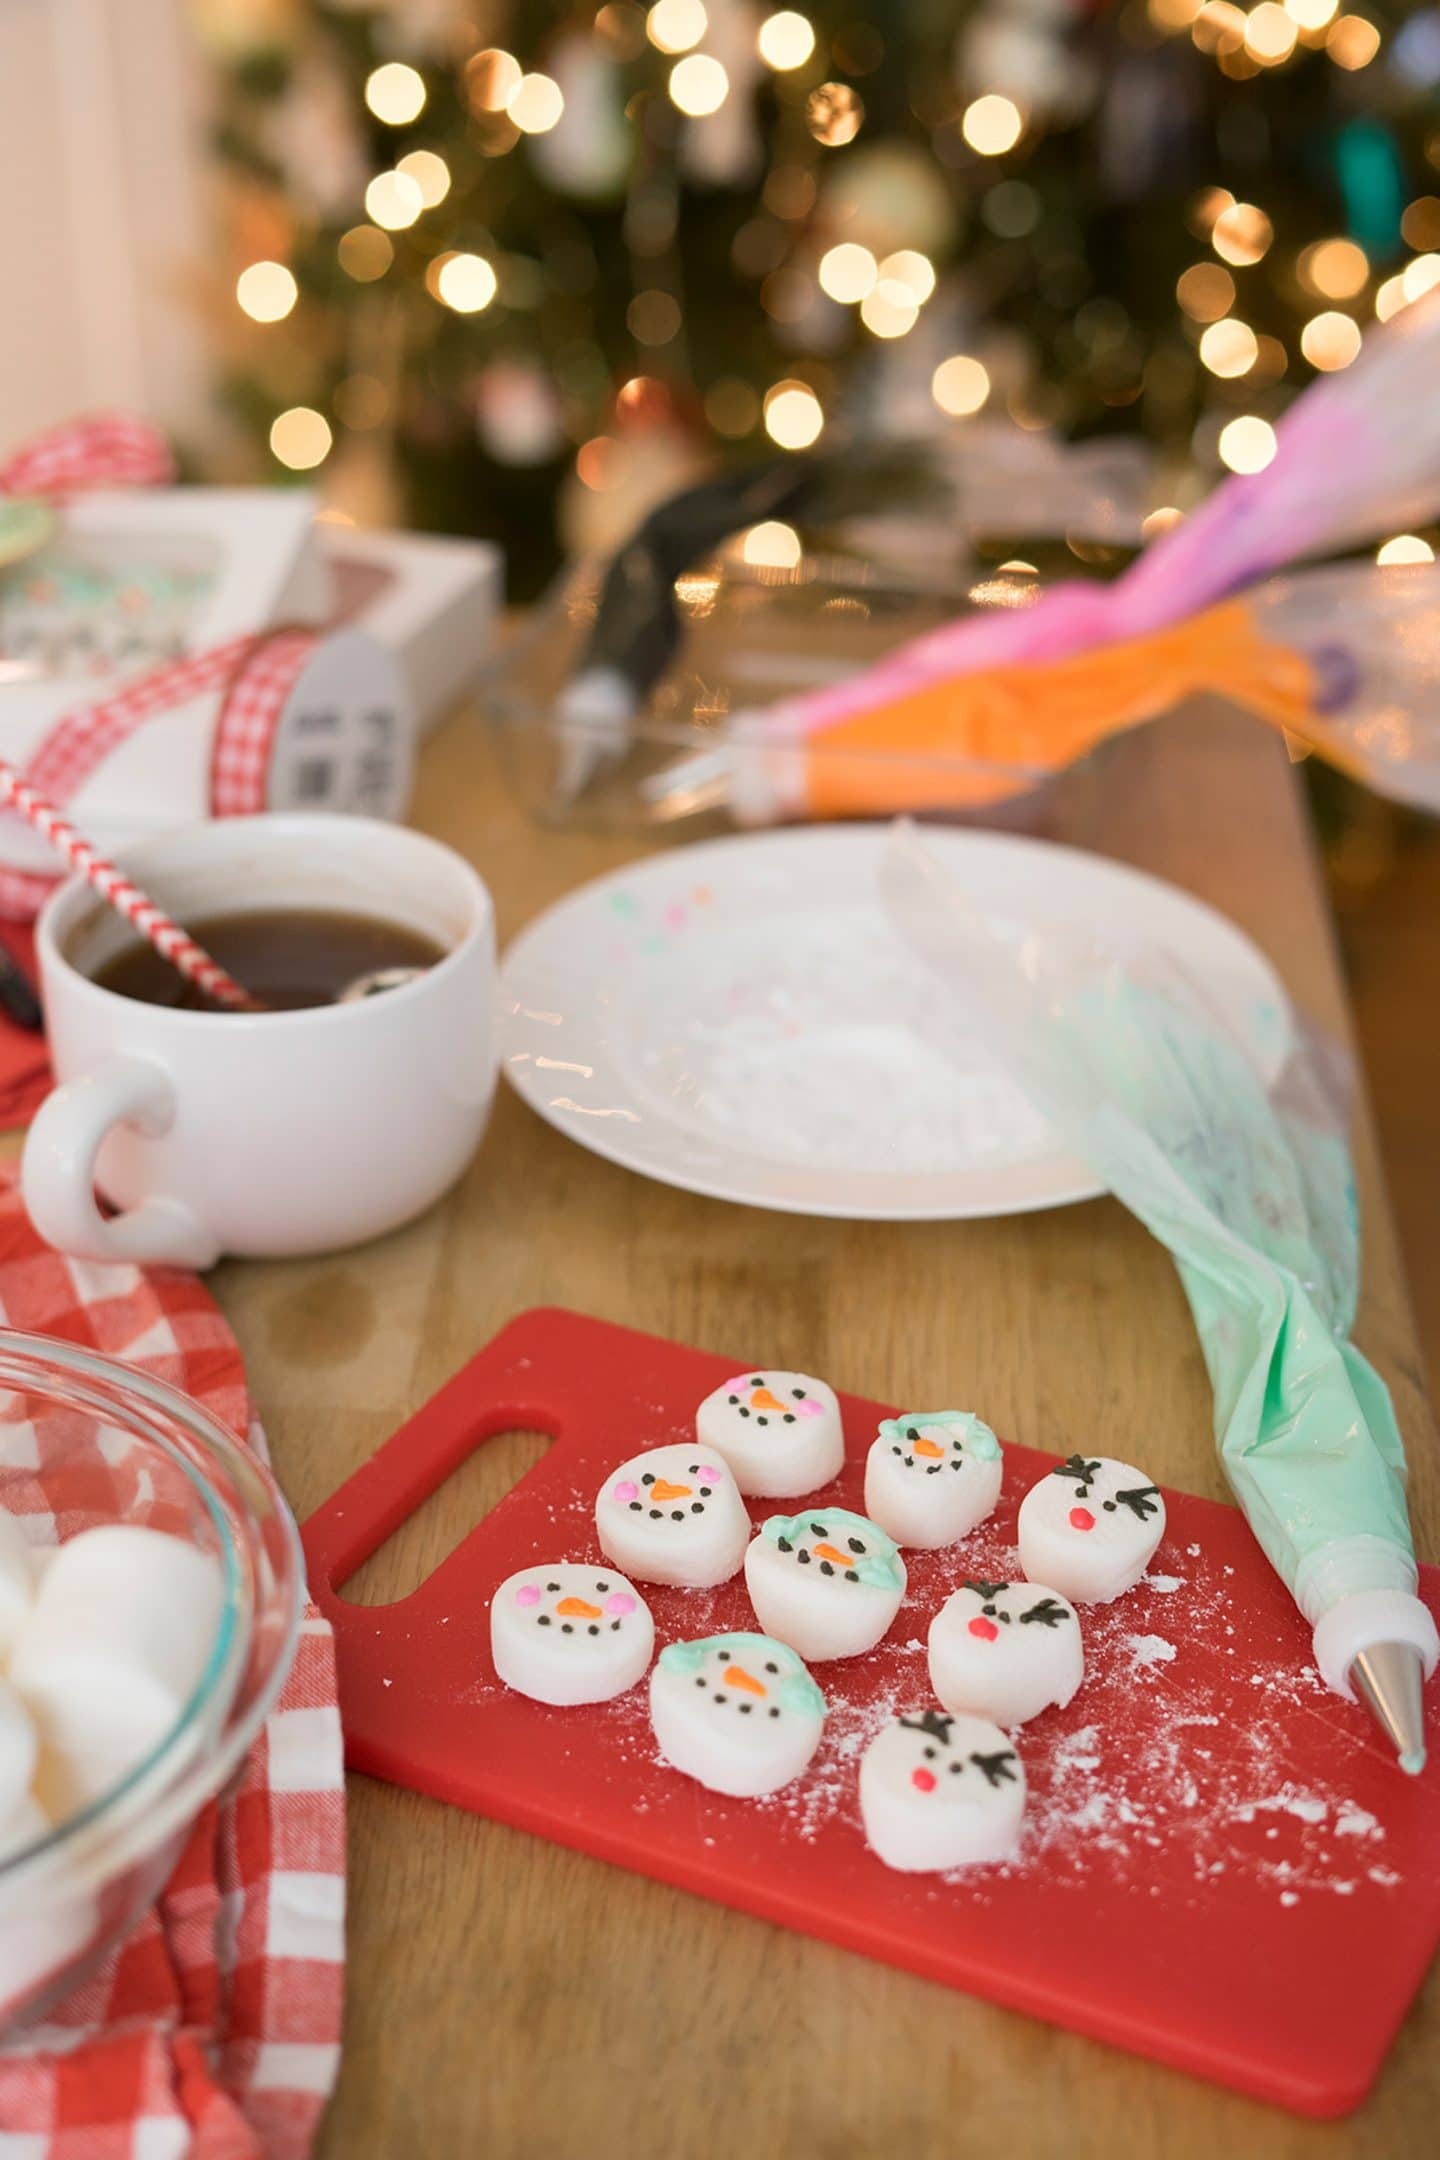 DIY Marshmallow Snowman for Hot Cocoa | www.ashleybrookedesigns.com